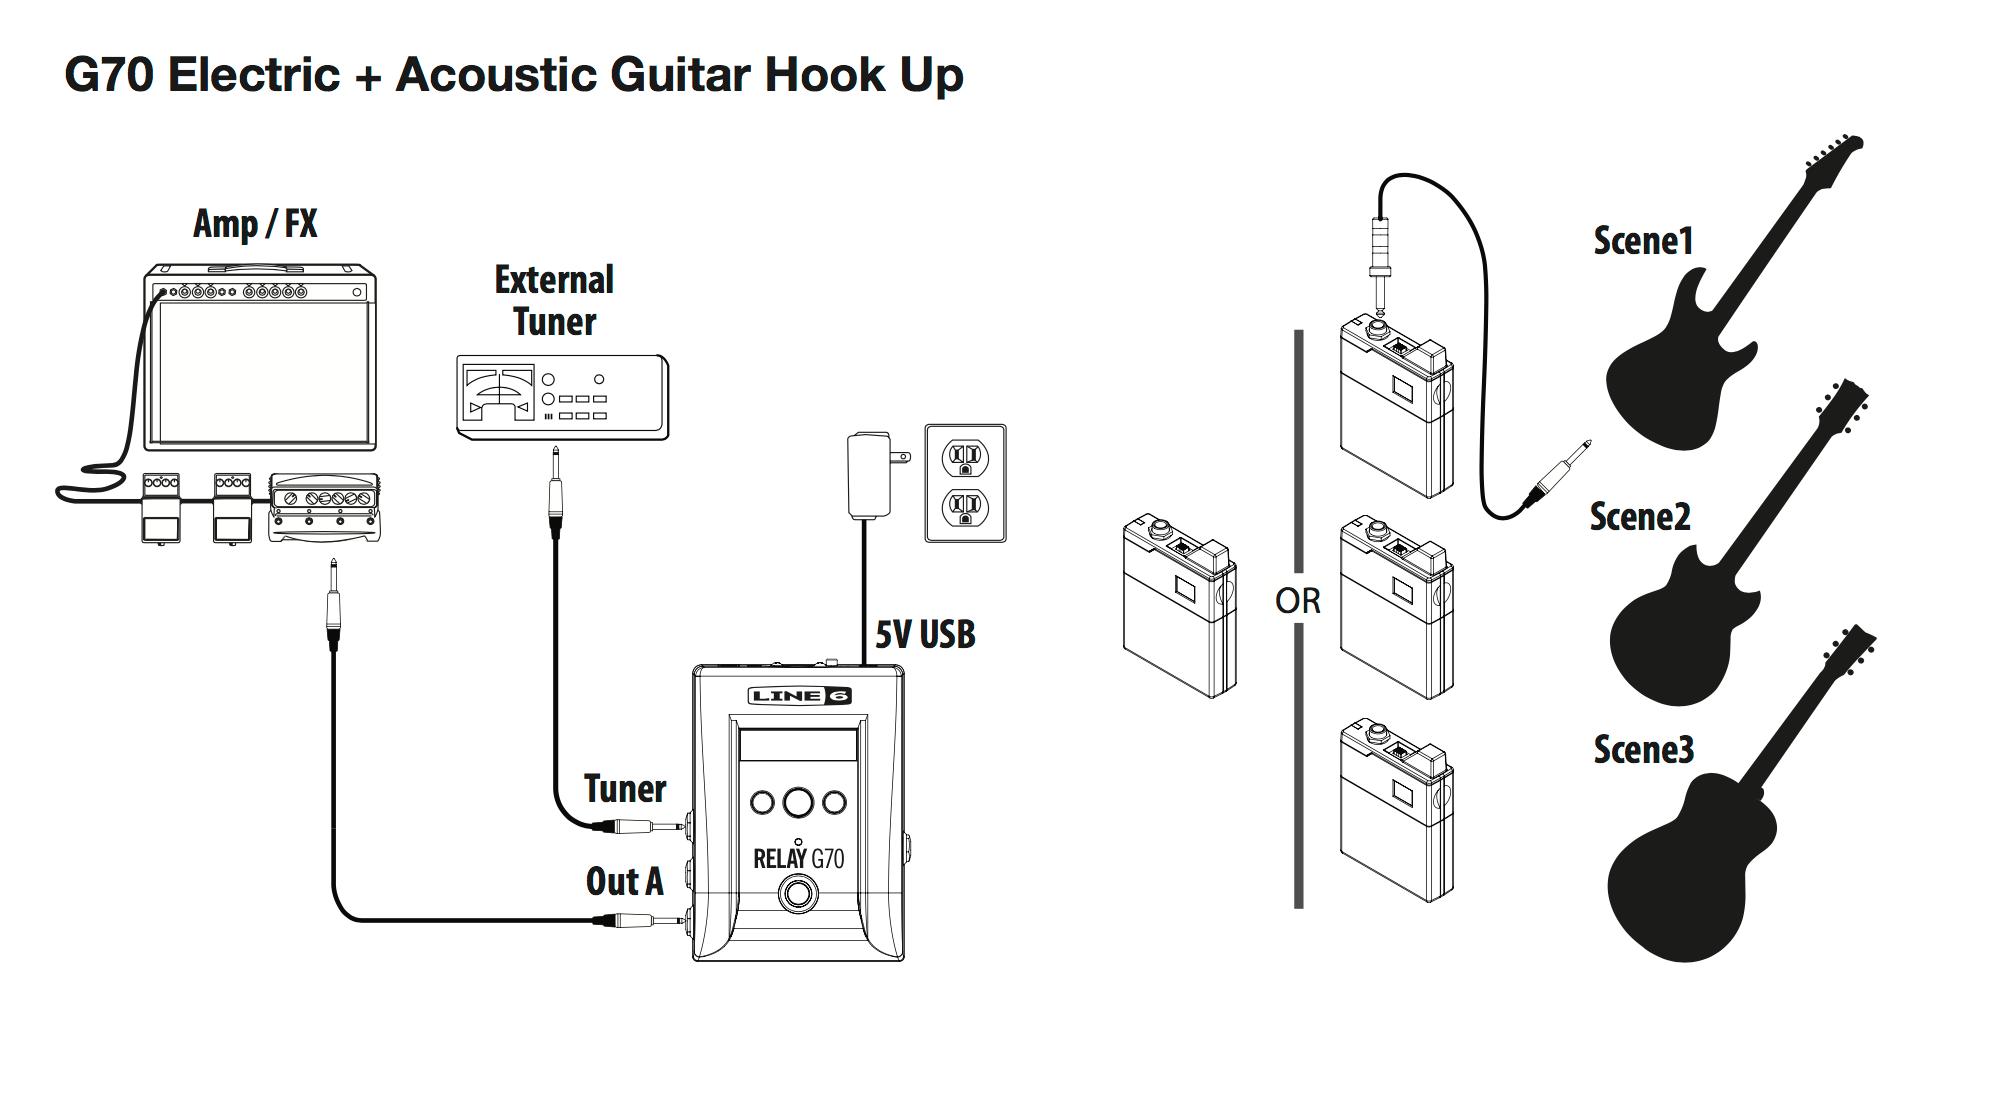 Line 6 Relay G70 Digital Wireless Guitar Pedal System